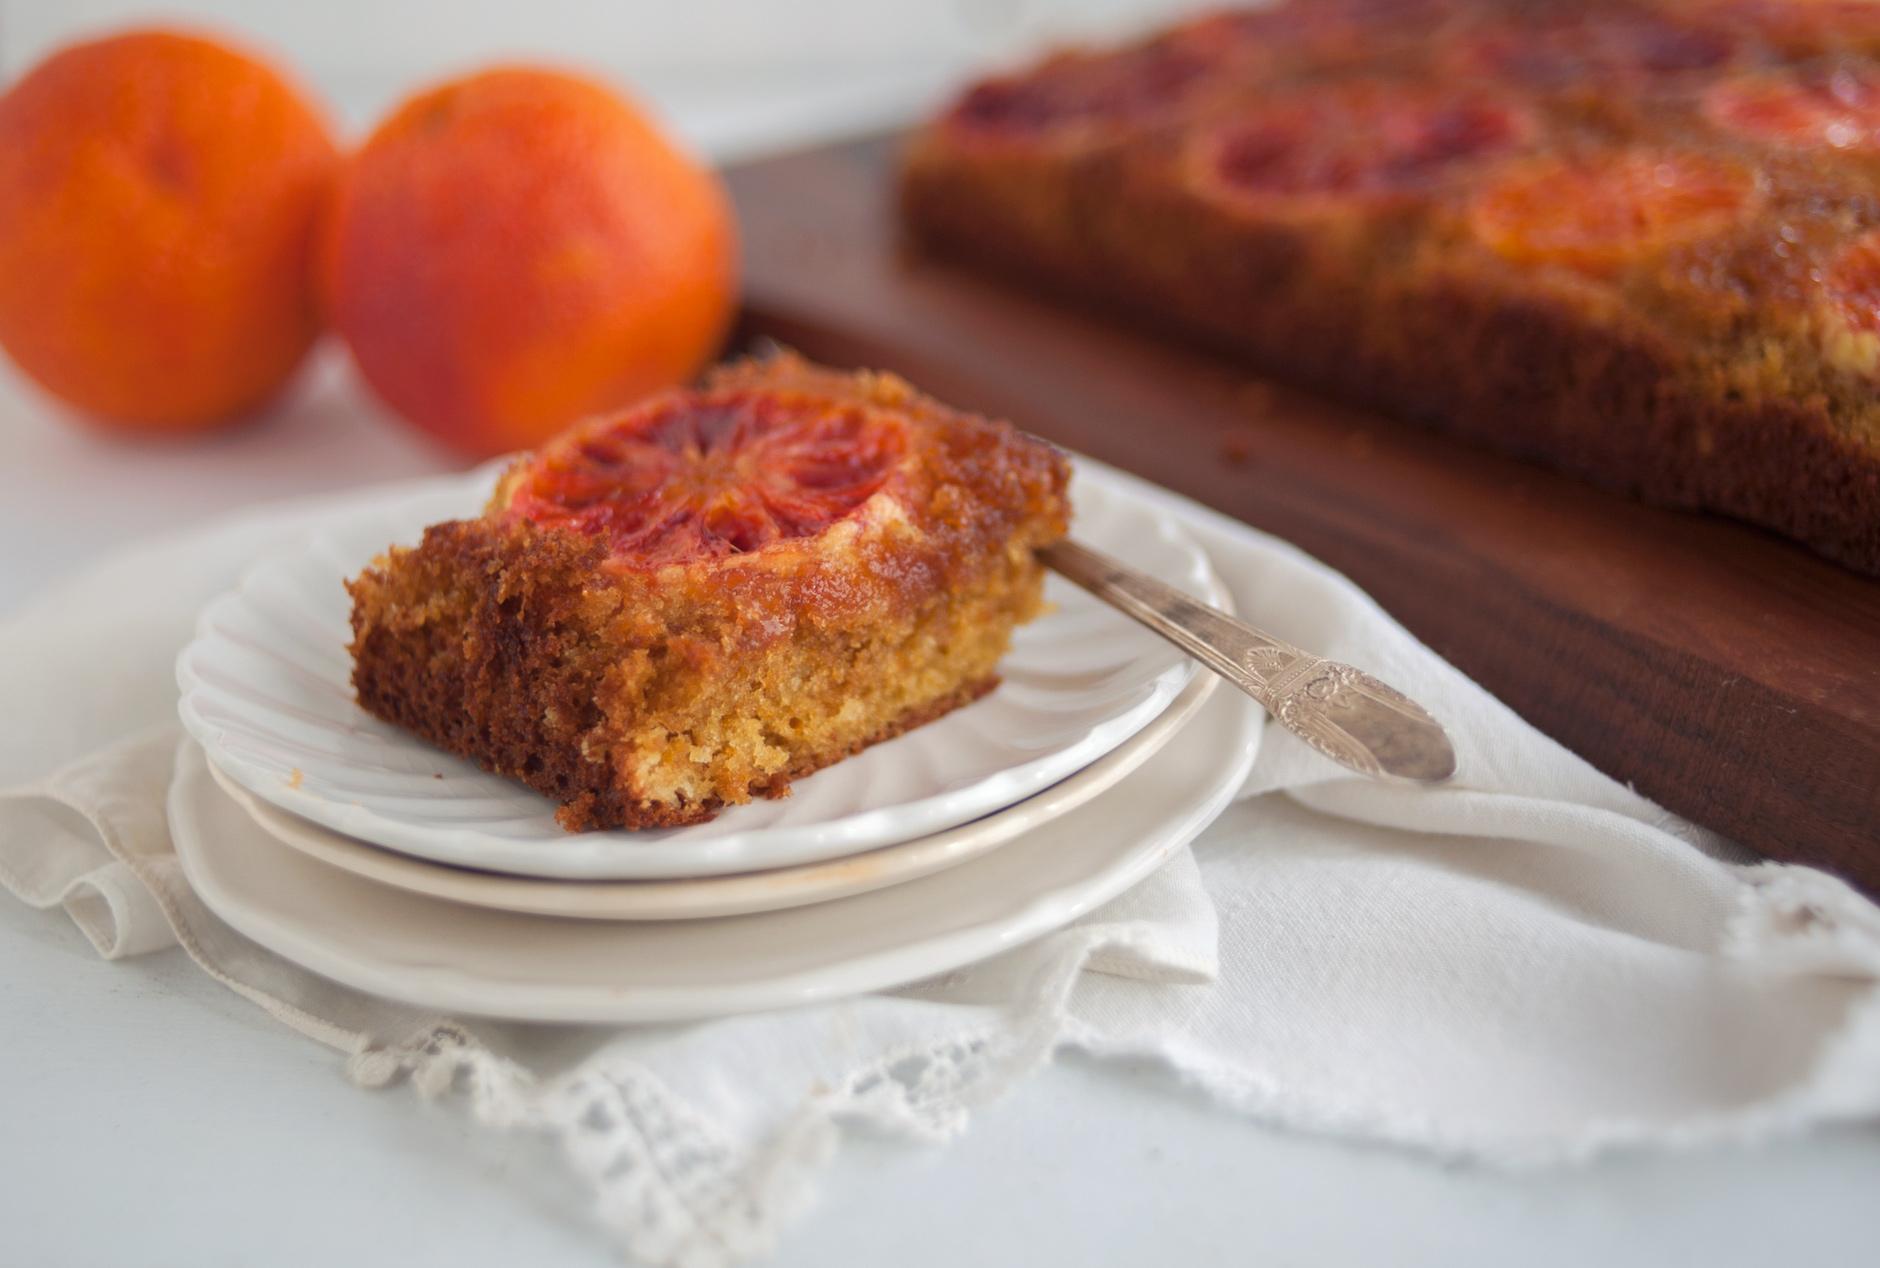 blood_orange_cake_food_photography_2.jpg